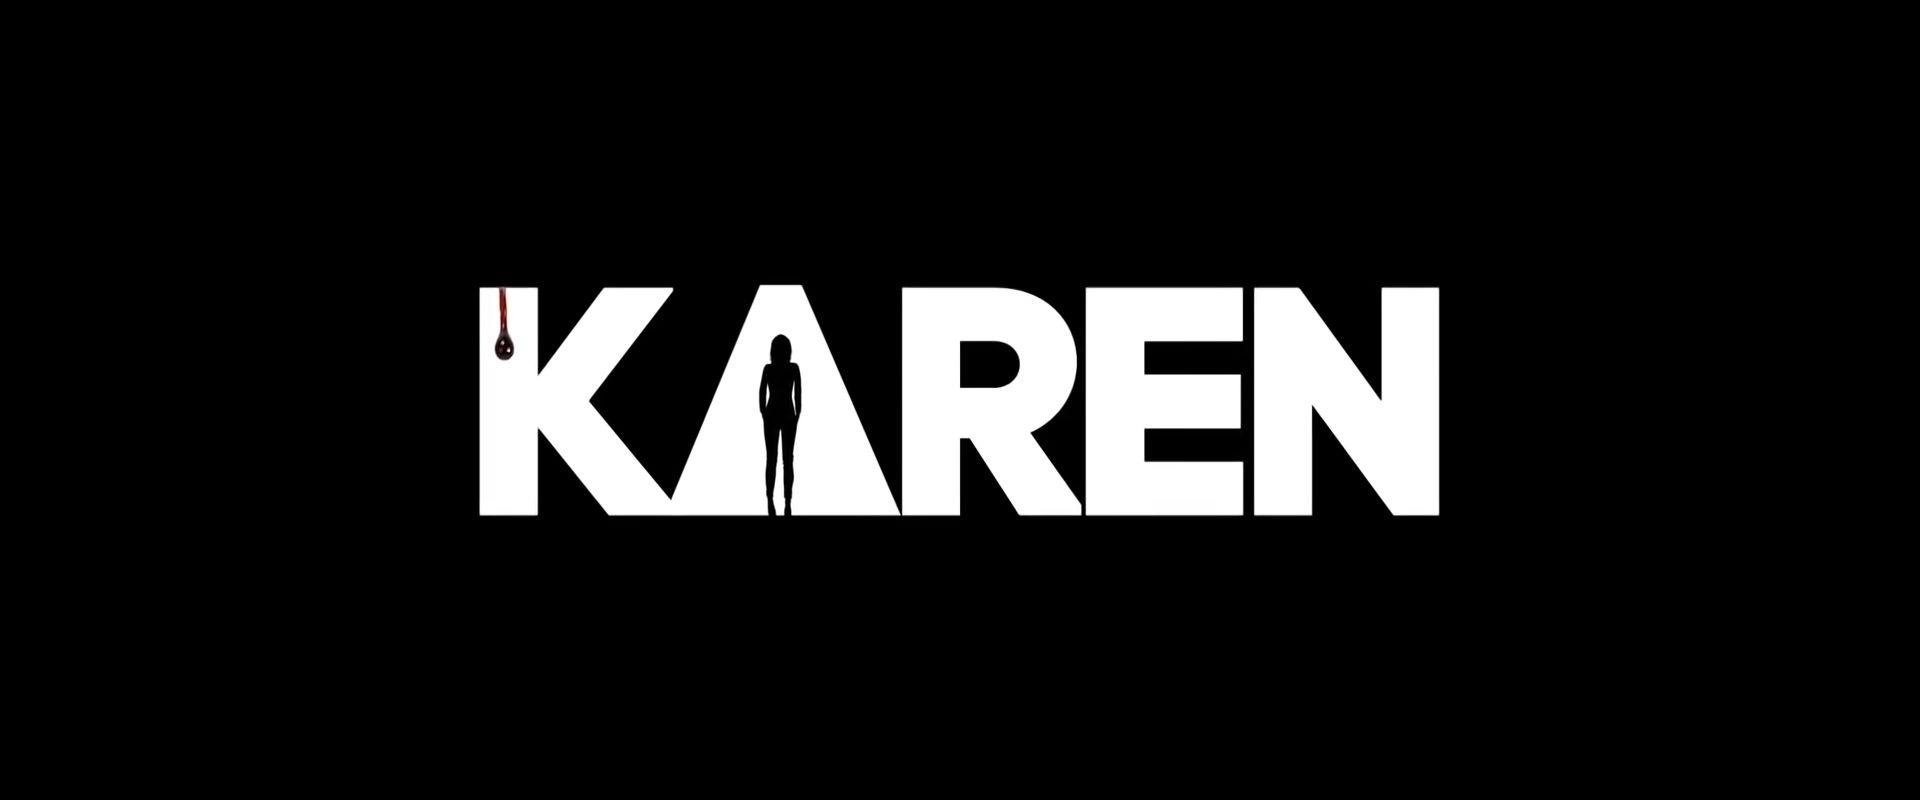 Karen Movie 2021 Release Date On Netflix